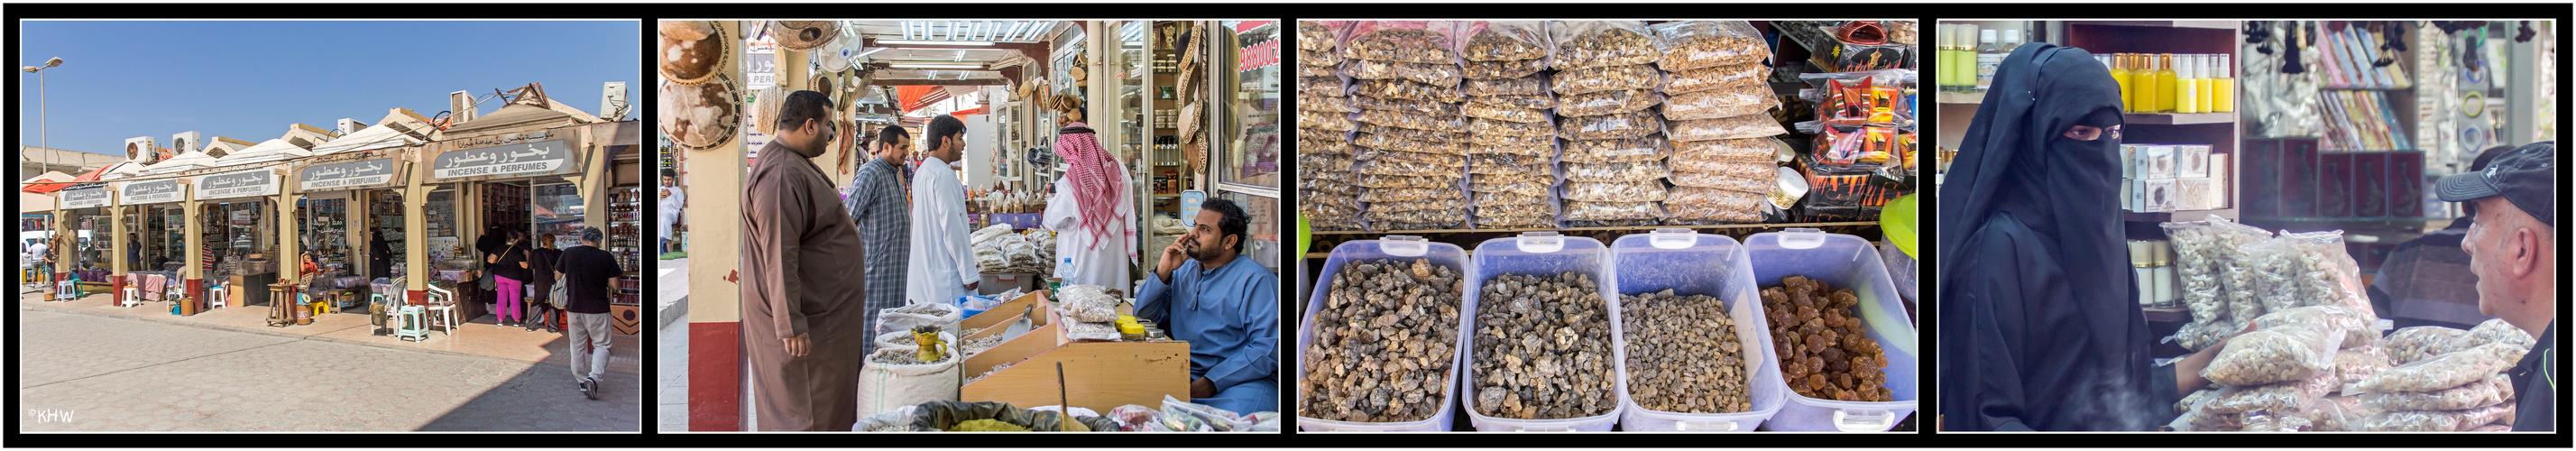 Weihrauchmarkt Salalah (Oman) 1